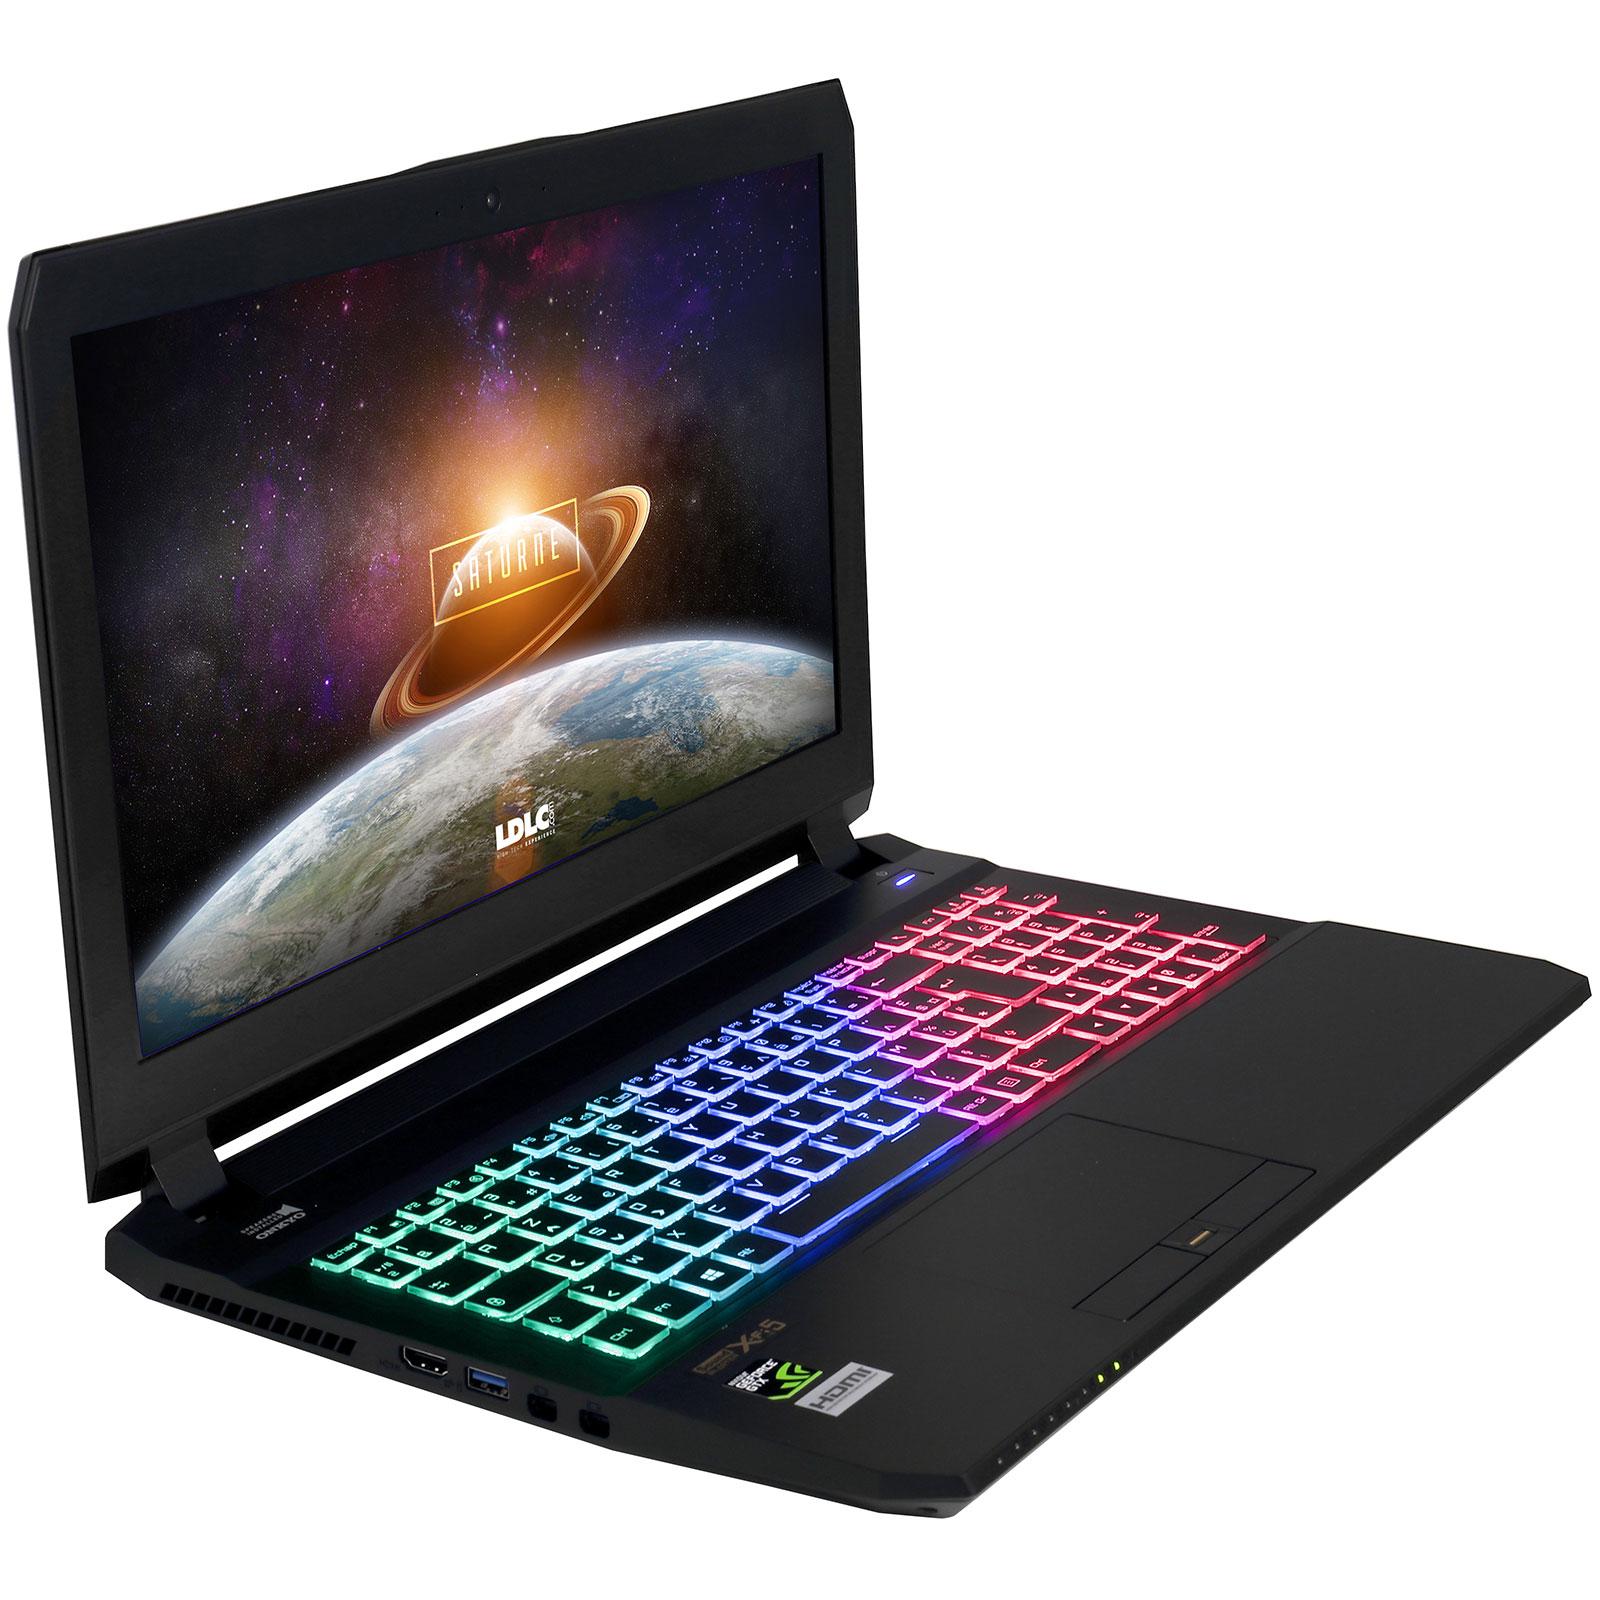 "PC portable LDLC Saturne TK71A-I7-16-H20S5-P10 Intel Core i7-7700HQ 16 Go SSD 525 Go + HDD 2 To 15.6"" LED Full HD NVIDIA GeForce GTX 1070 8 Go Wi-Fi AC/Bluetooth Webcam Windows 10 Professionnel 64 bits"